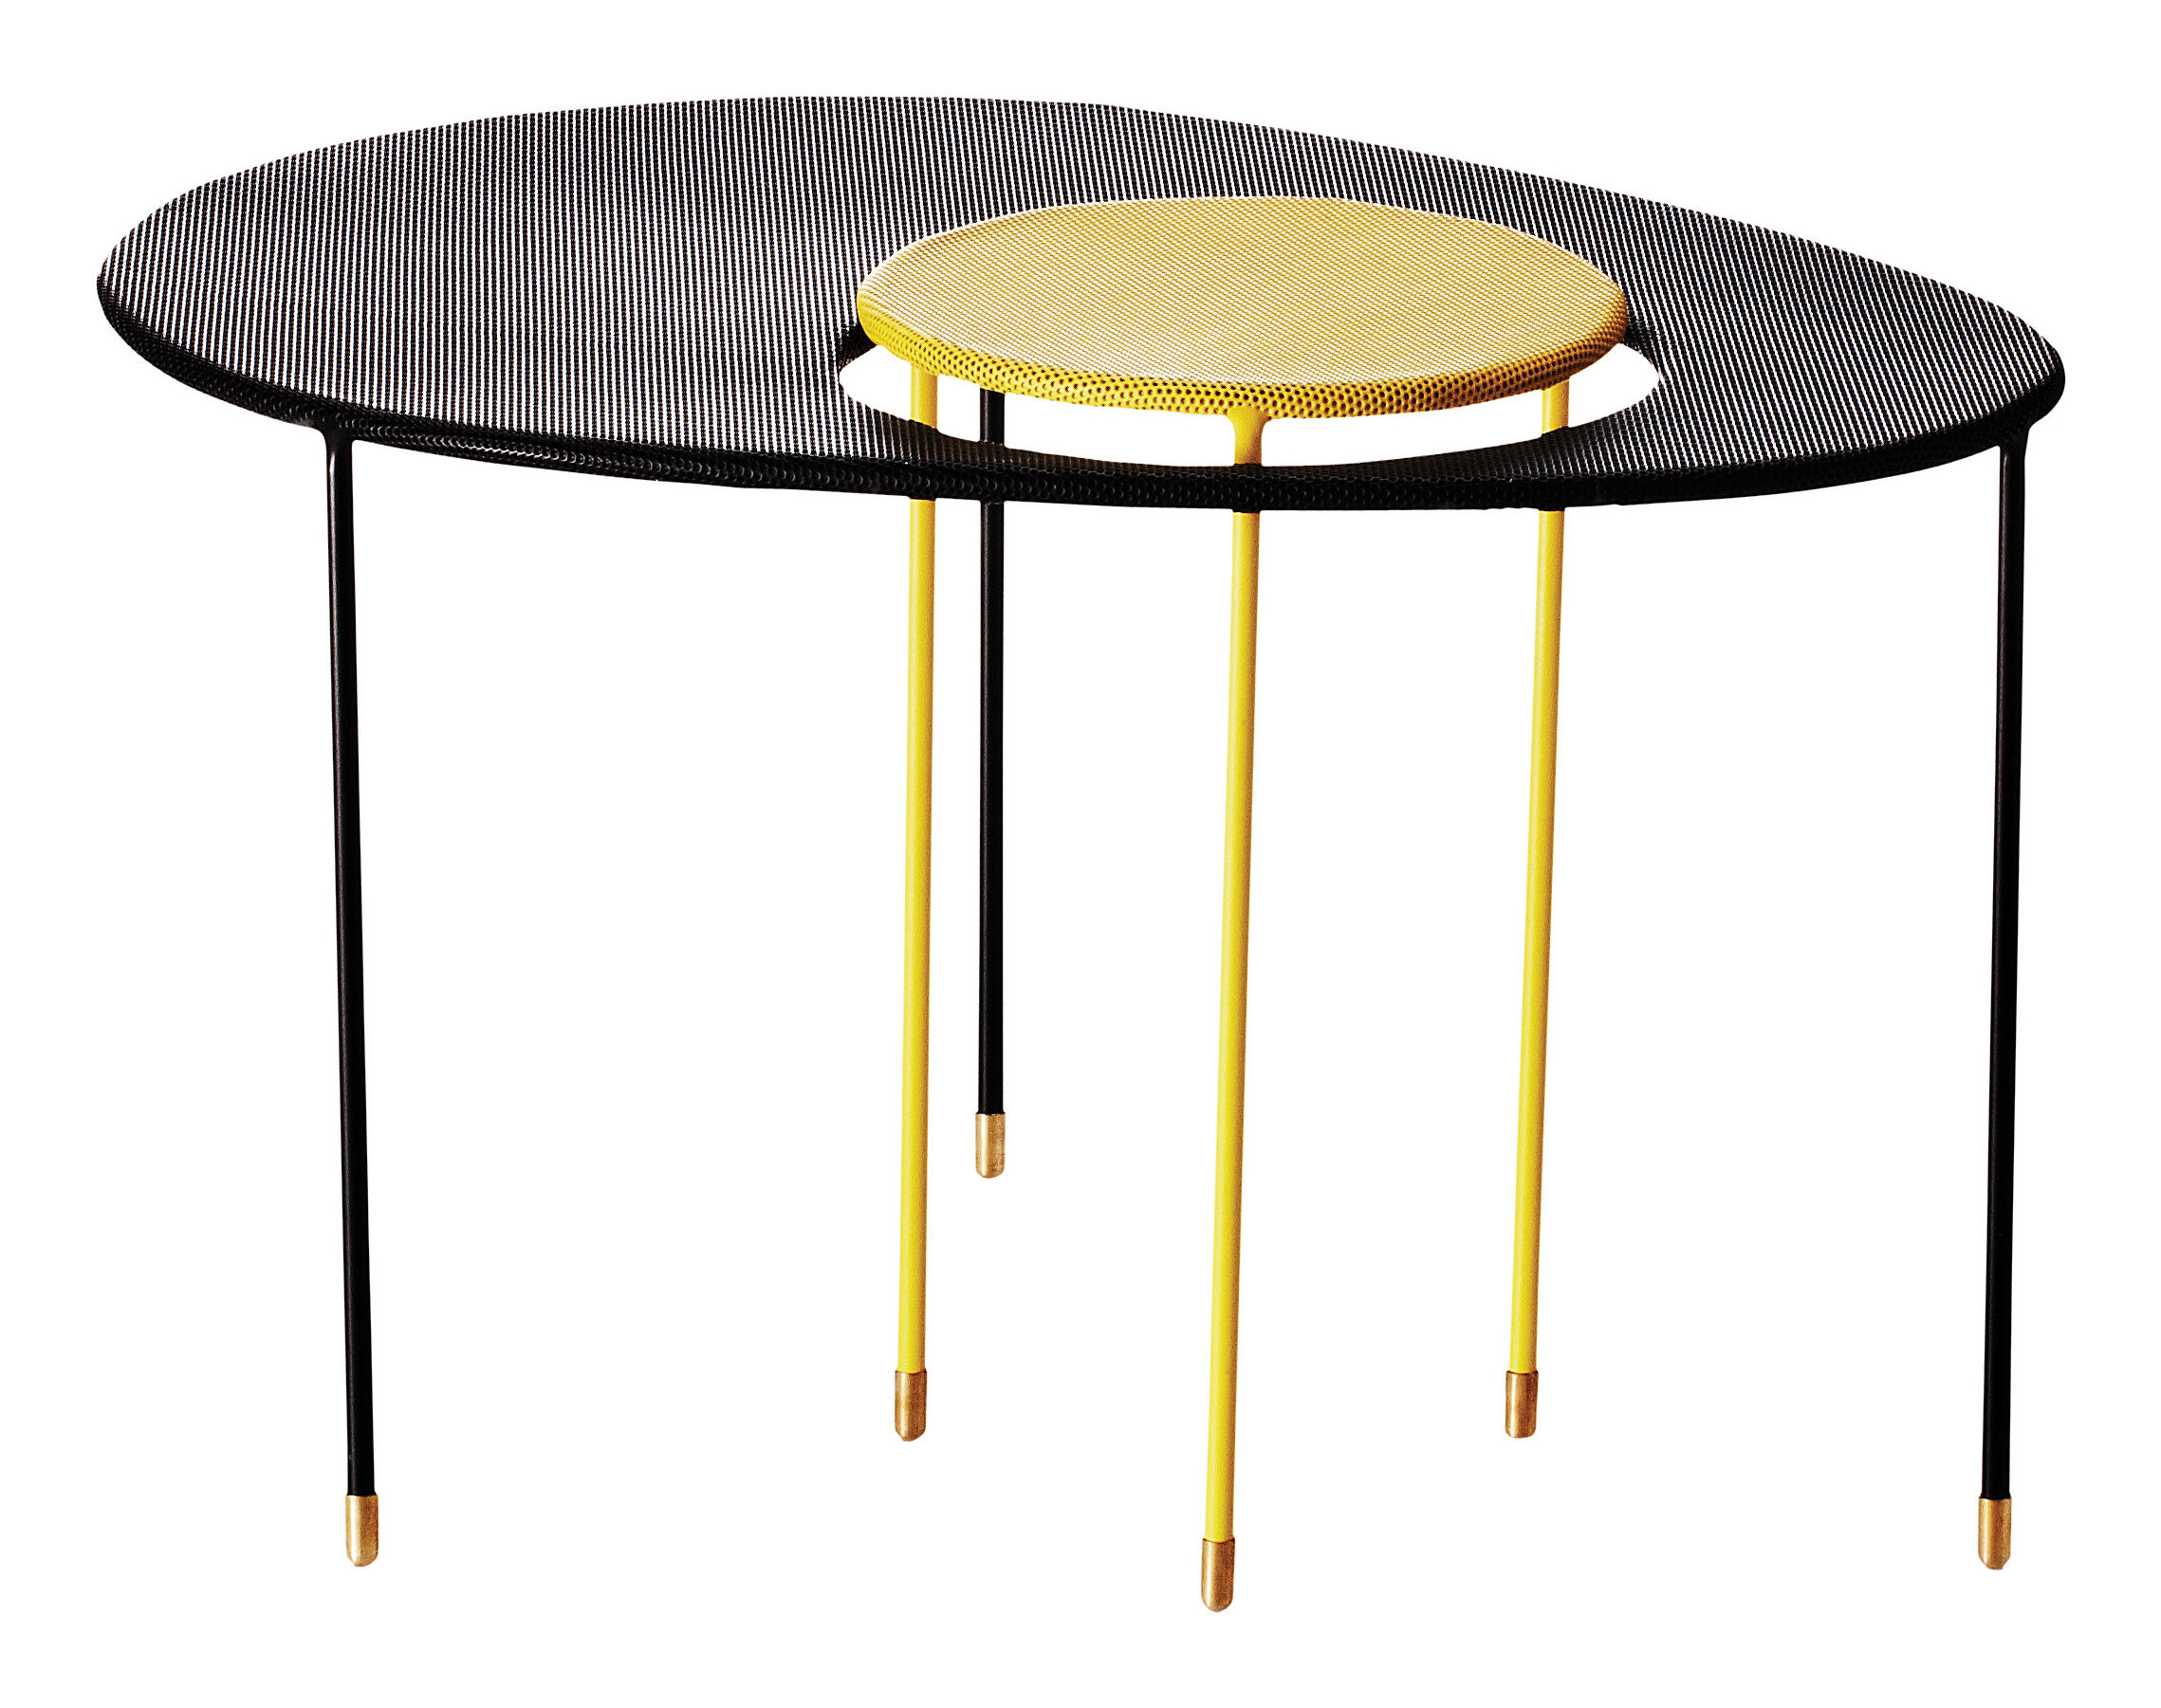 scopri tavolini estraibili kangourou set 2 tavoli sovrapponibili rieditata 50 39 nero giallo. Black Bedroom Furniture Sets. Home Design Ideas